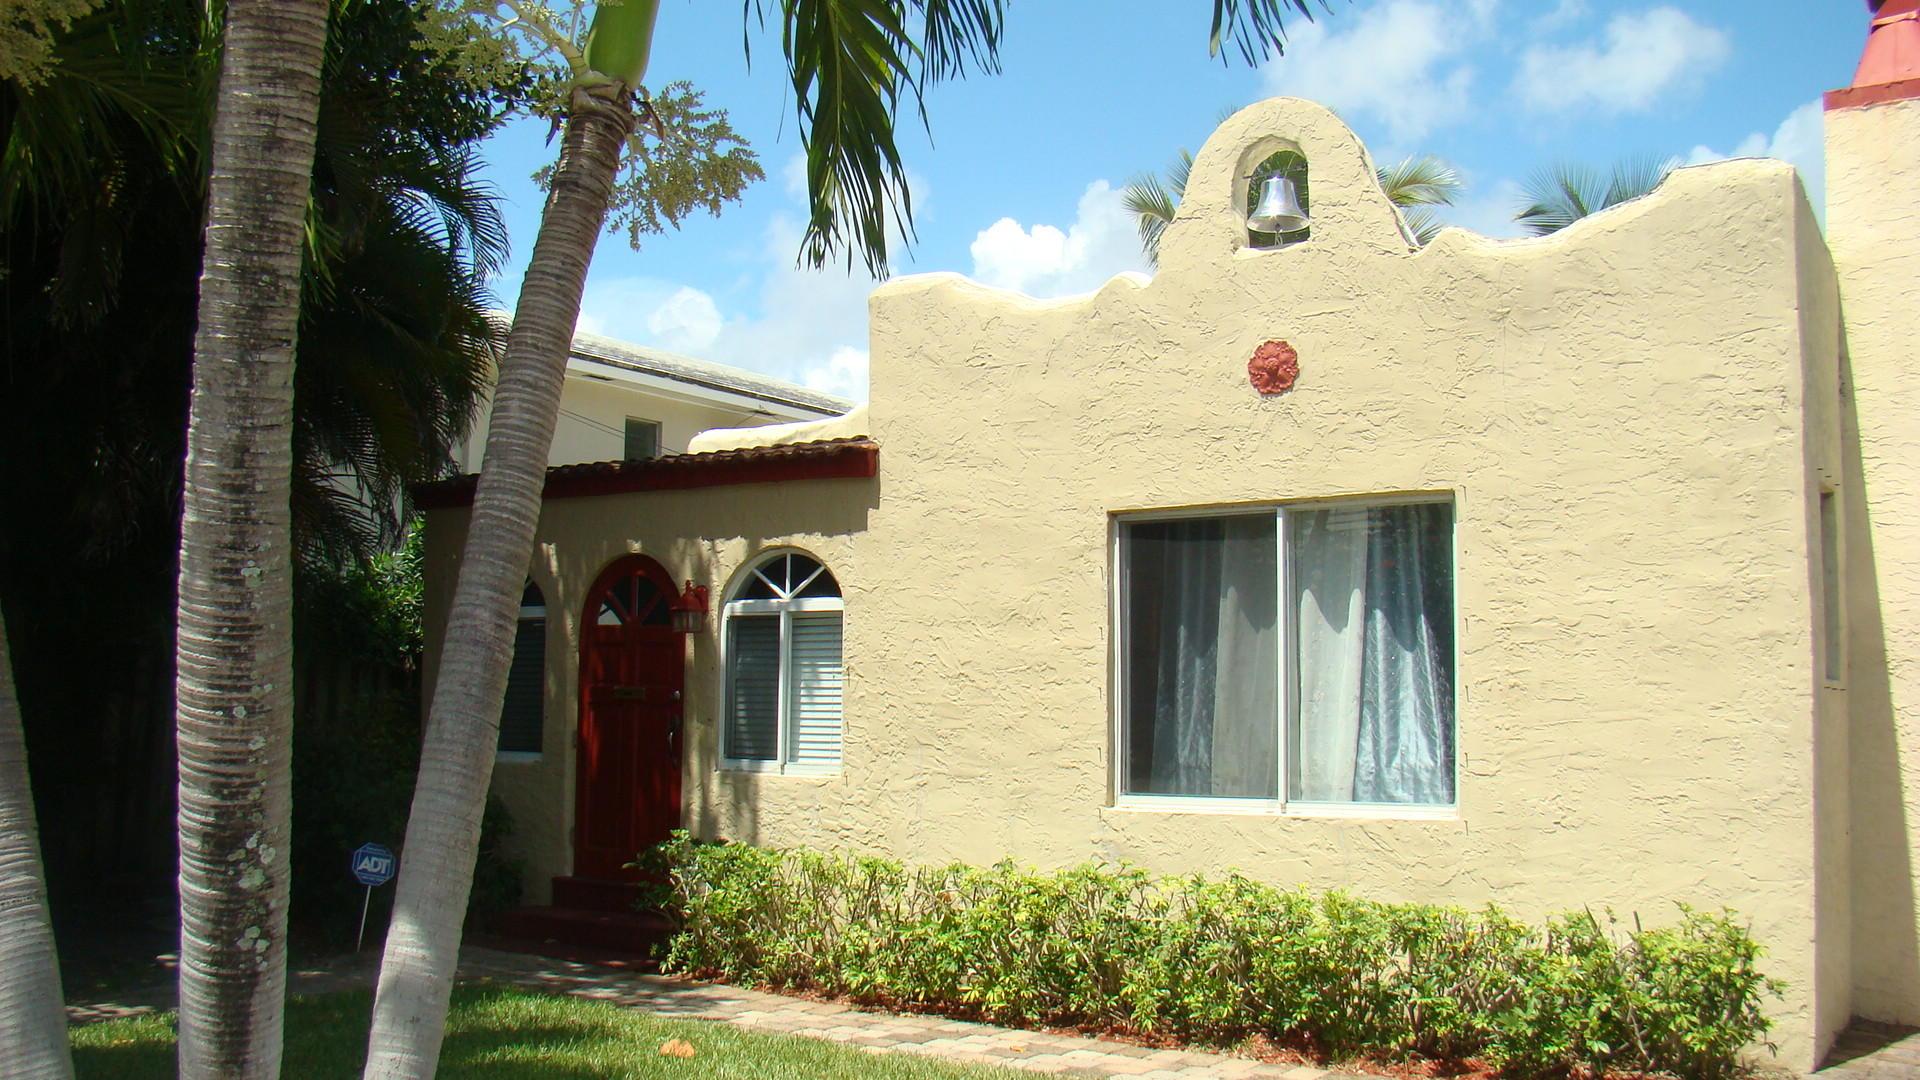 430 7th Avenue, Delray Beach, Florida 33483, 5 Bedrooms Bedrooms, ,3 BathroomsBathrooms,Residential,For Sale,7th,RX-10549504